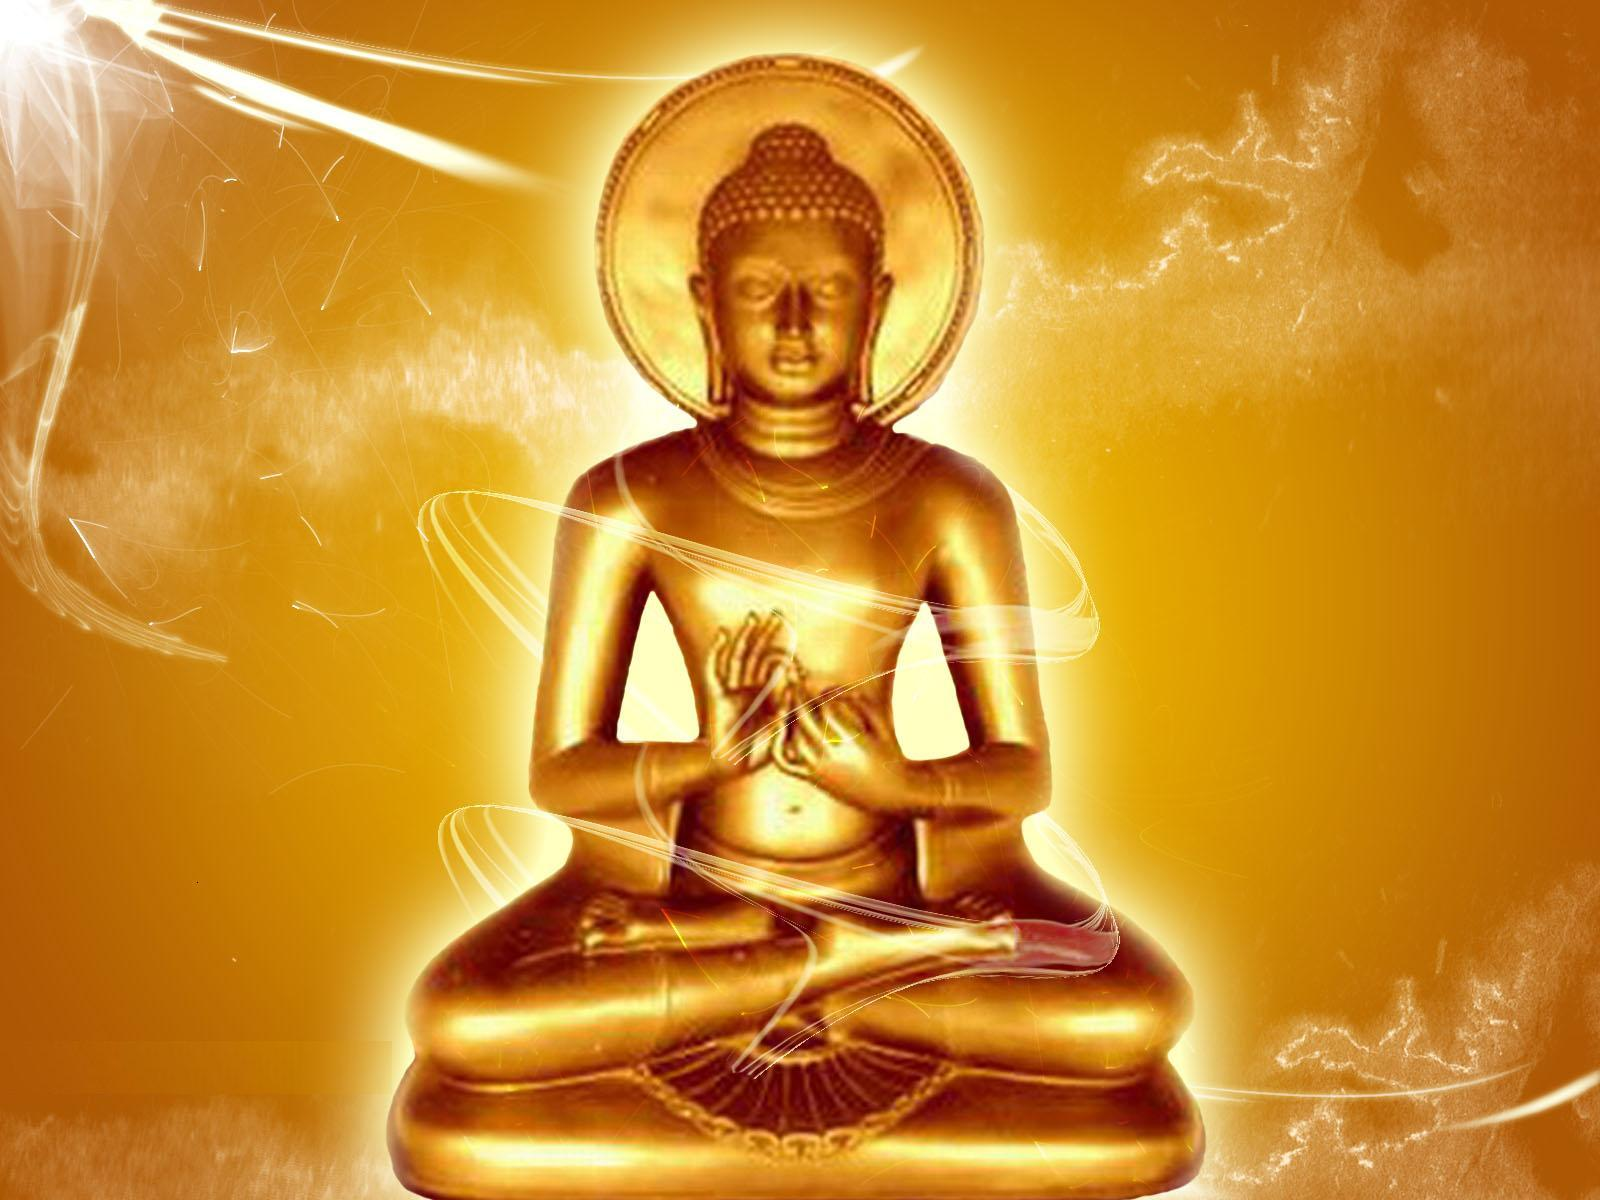 Hd Wallpaper Gautam Buddha Lord Gautama Buddha Ji God Pictures